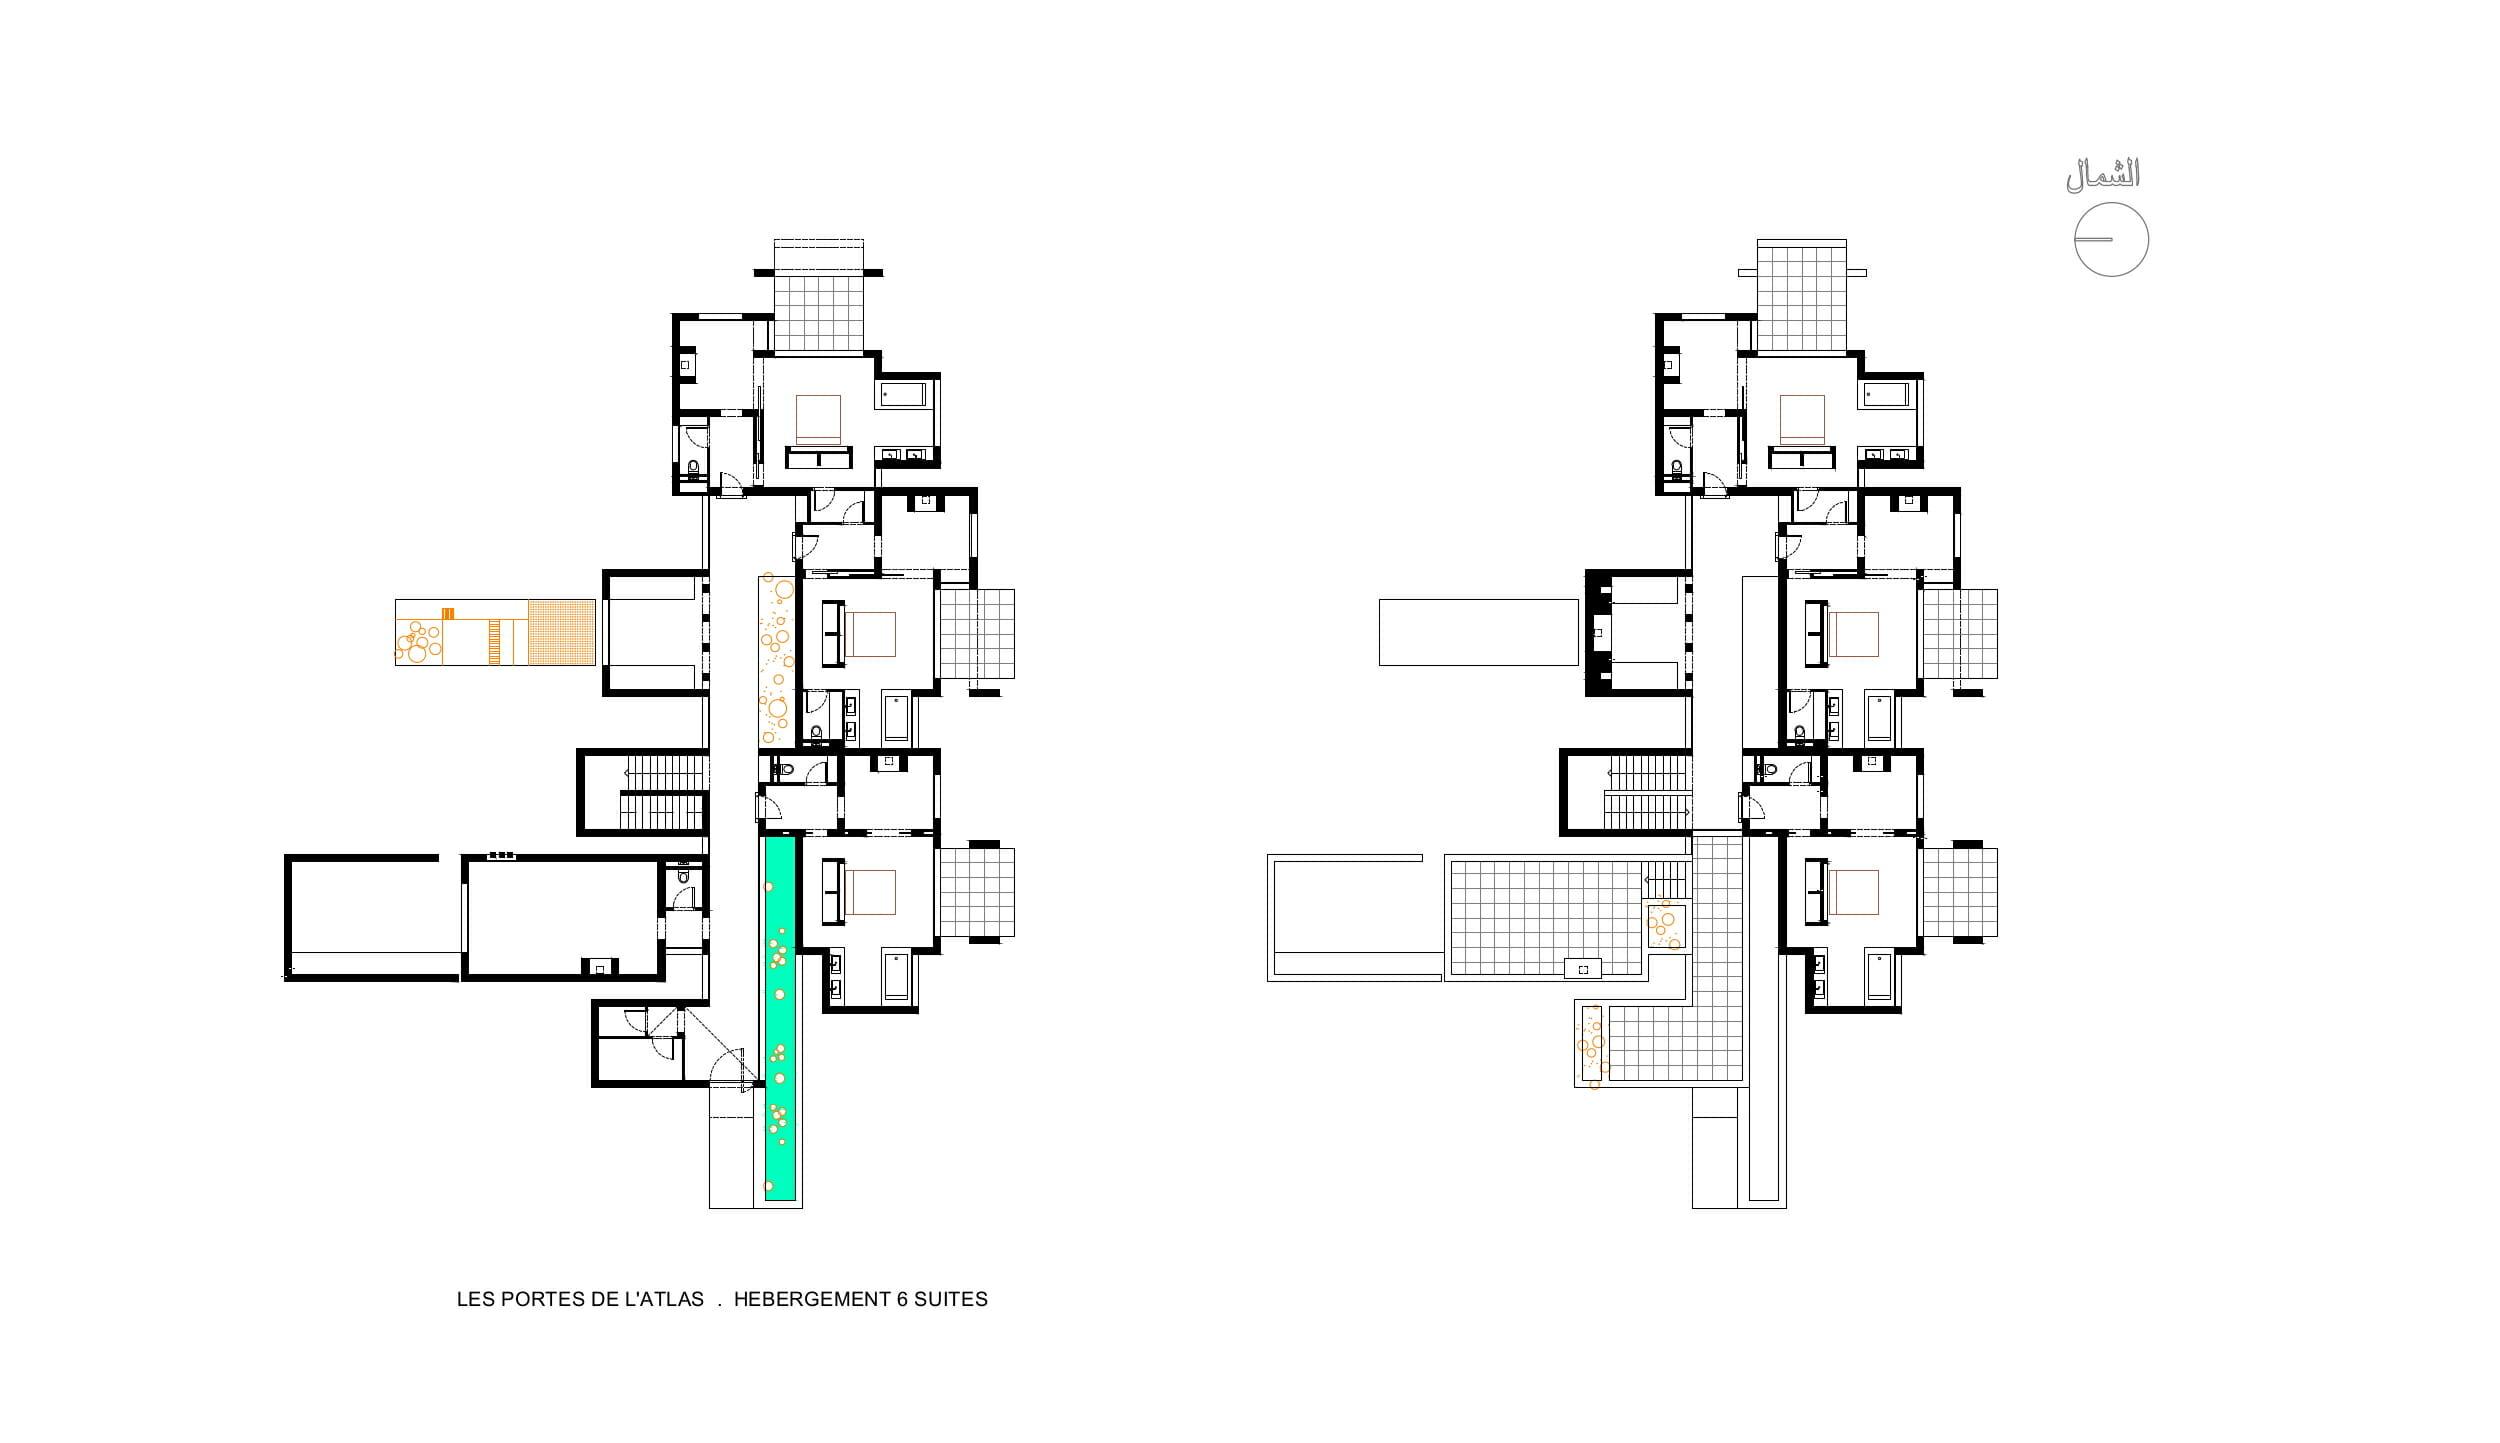 PORTES ATLAS.plan-4-suitesB